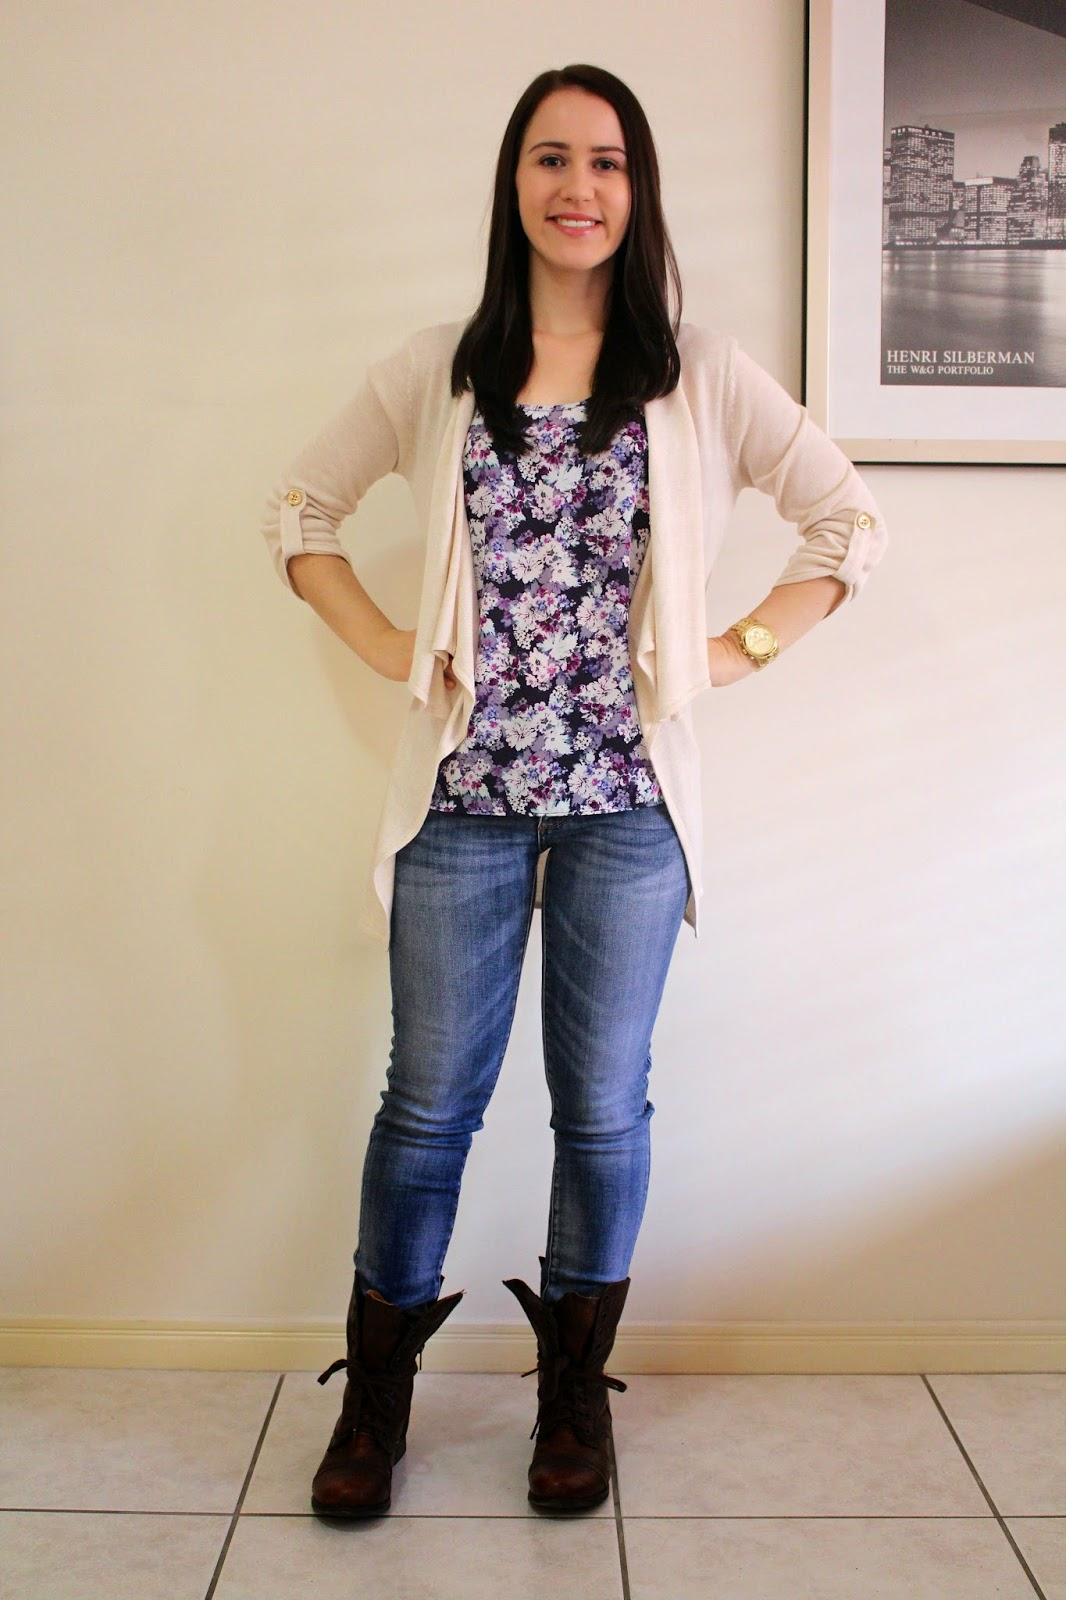 Light wash denim jeans, purple floral tank top, cream cardigan, brown/tan combat boots, gold michael kors watch, pandora rings, everyday outfit, uni outfit, college outfit, petite outfit, fall outfit